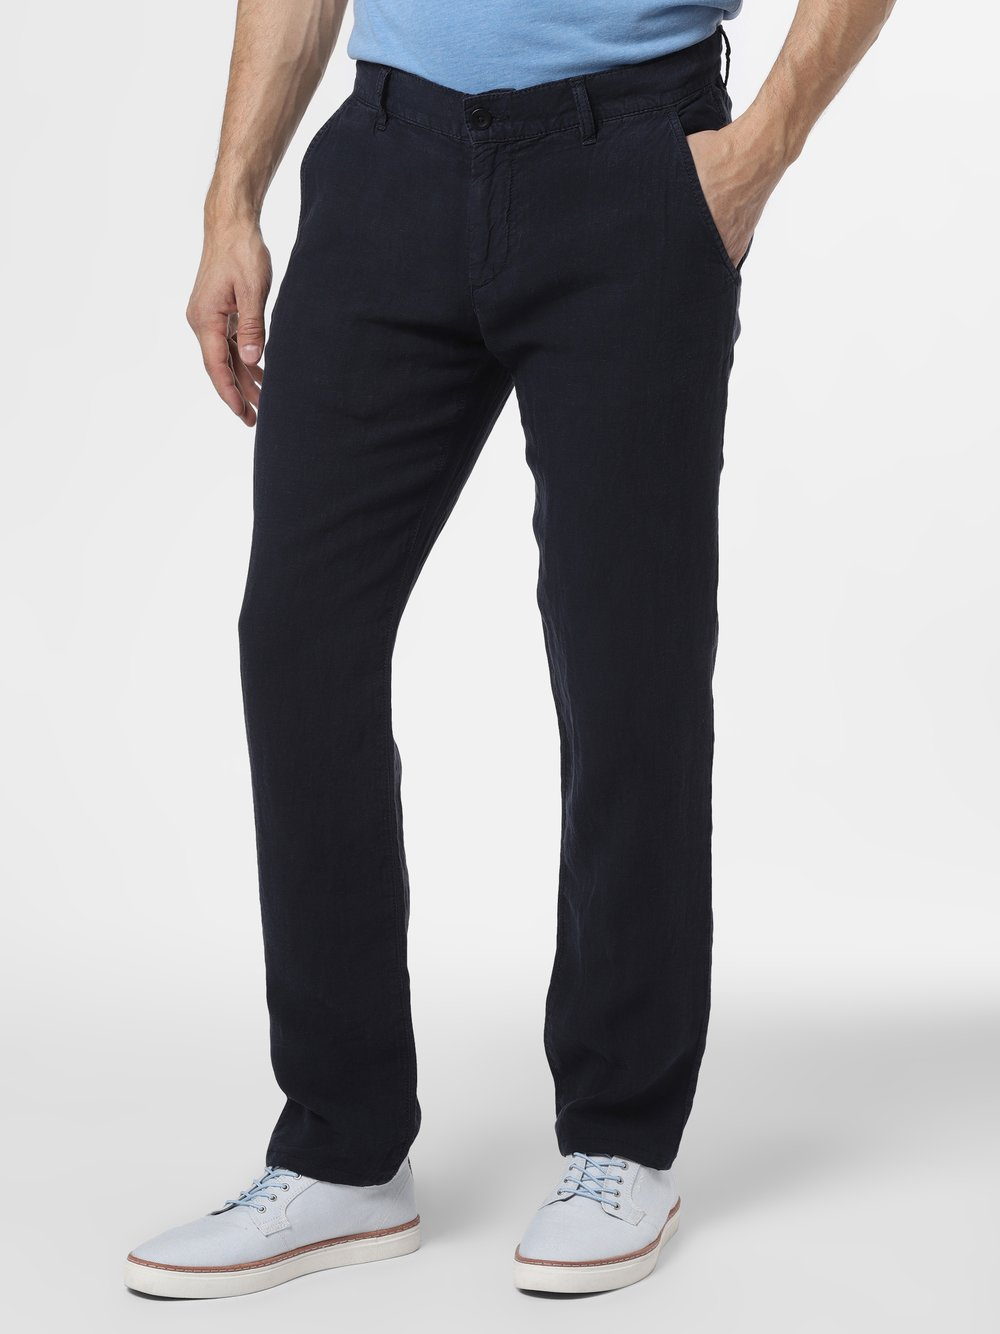 Alberto – Męskie spodnie lniane, niebieski Van Graaf 463335-0003-03232